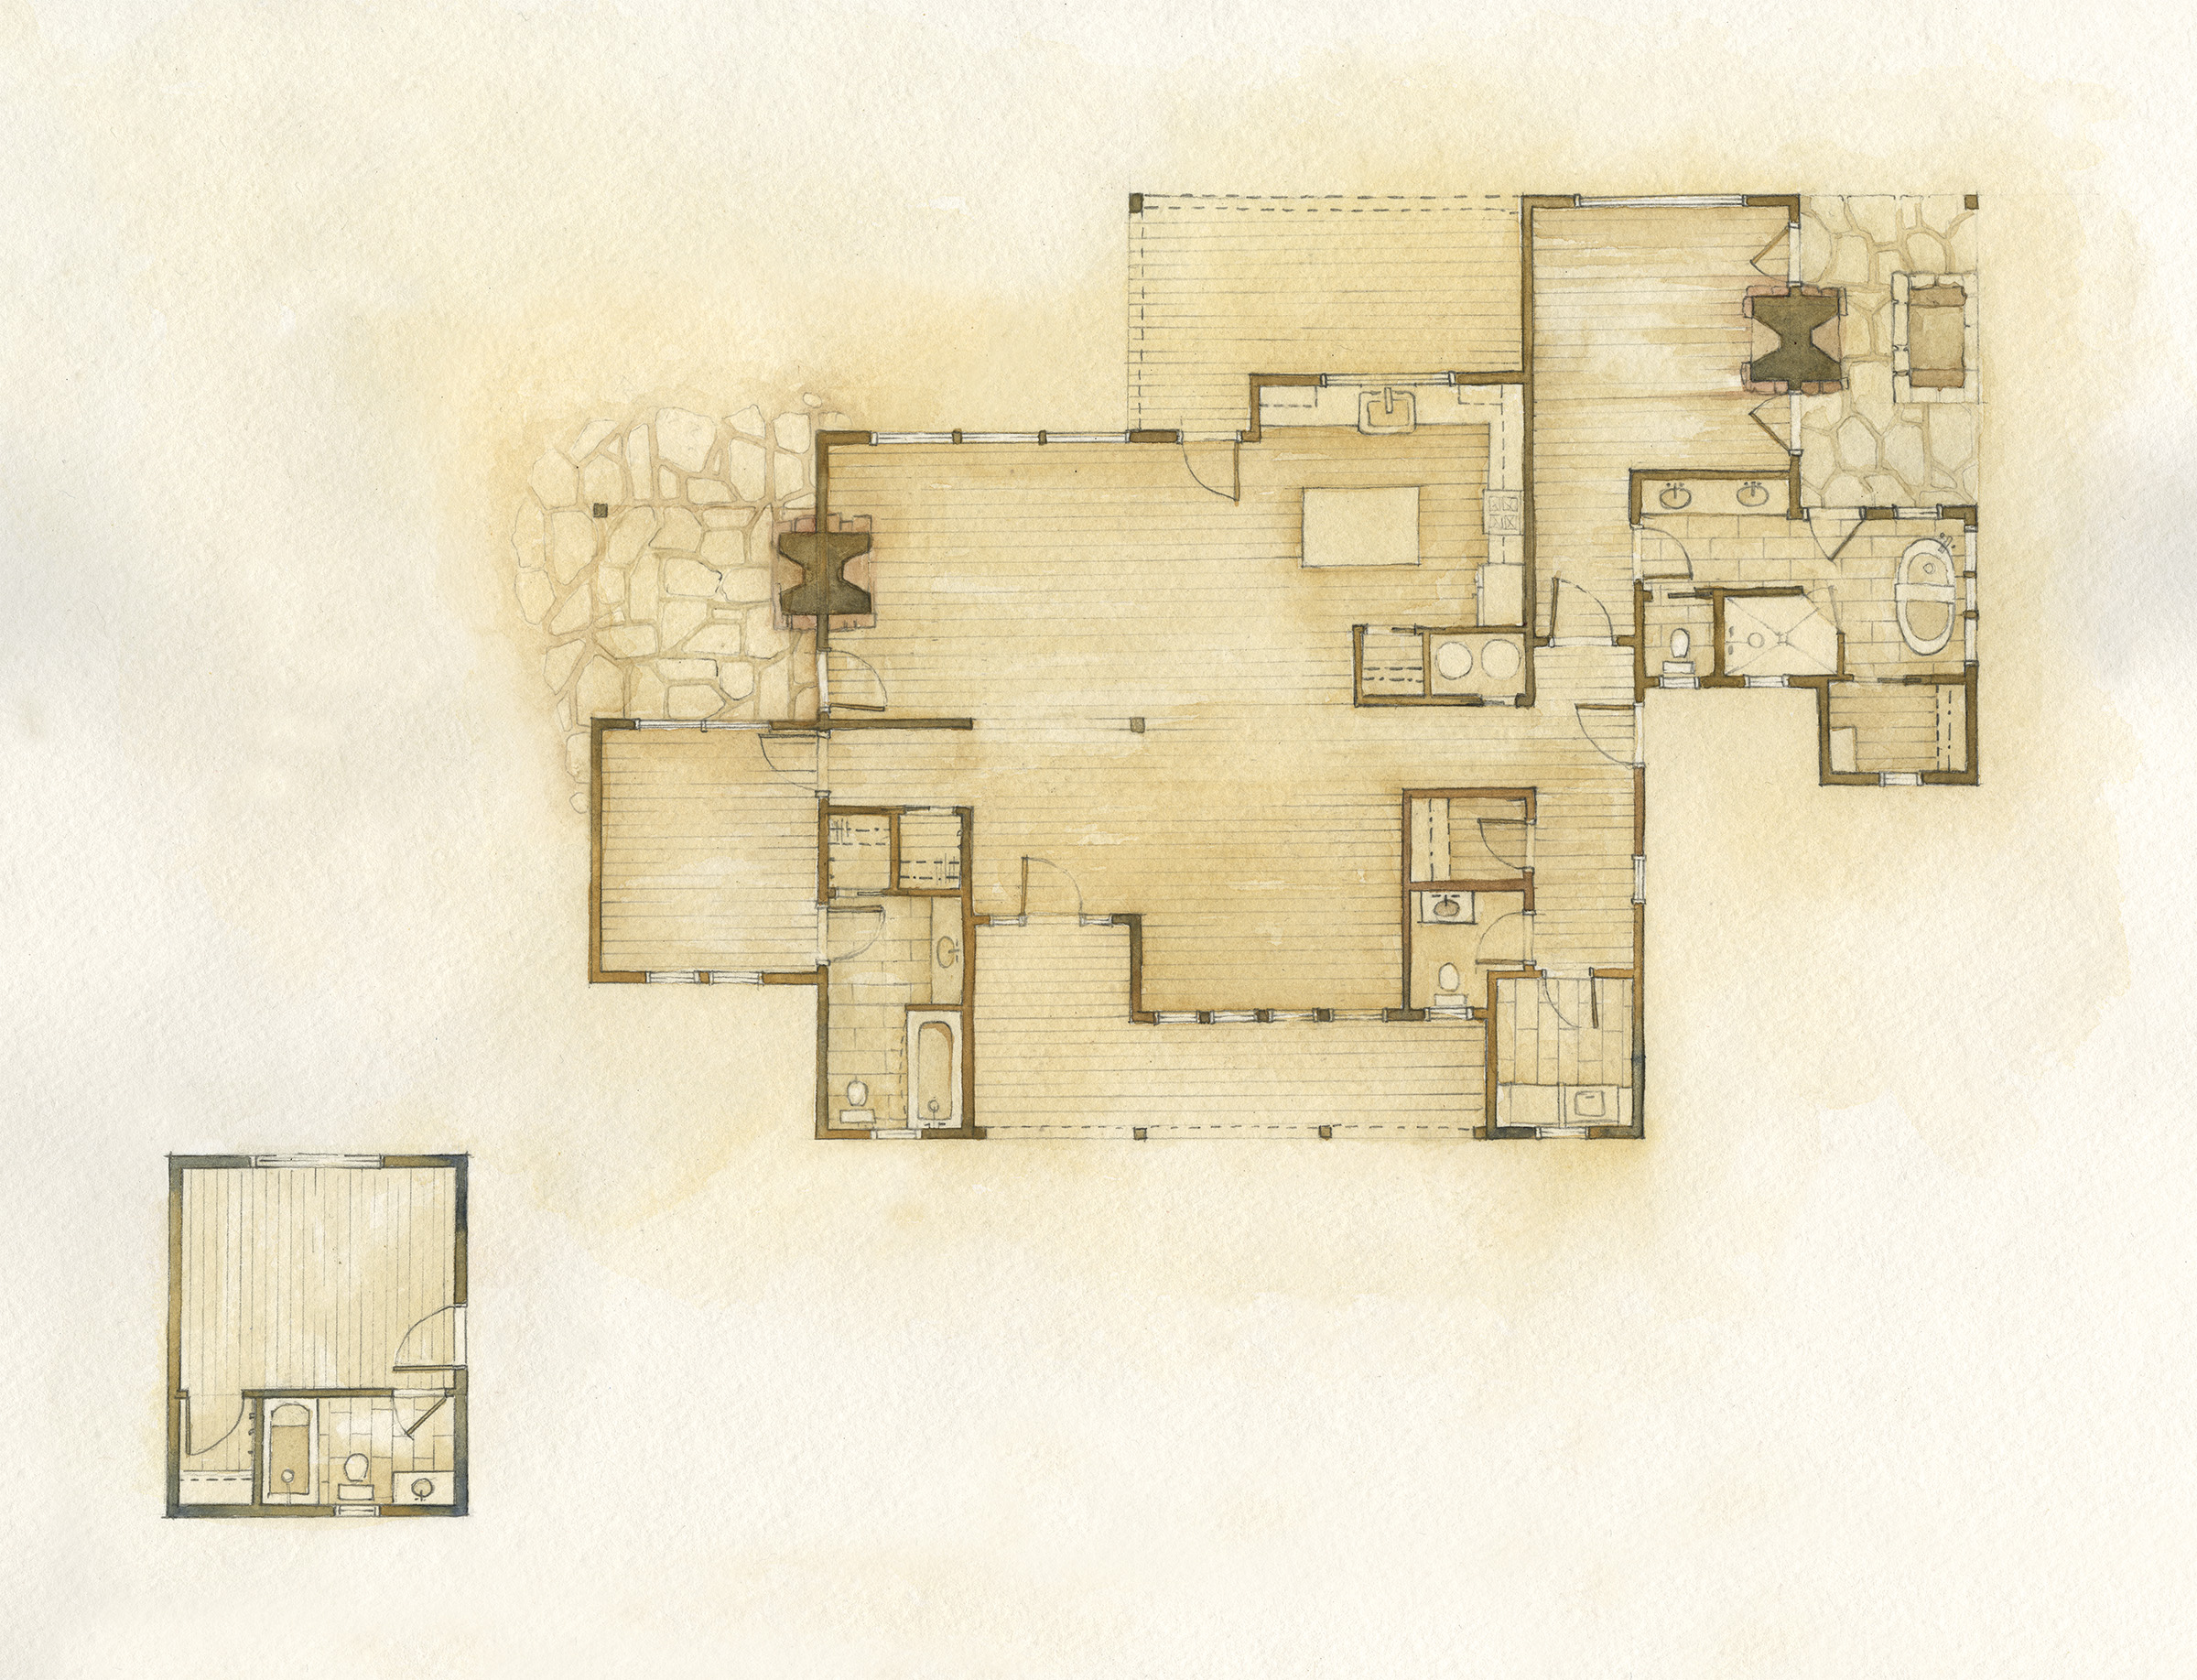 Lot 22 Floor Plan email.jpg